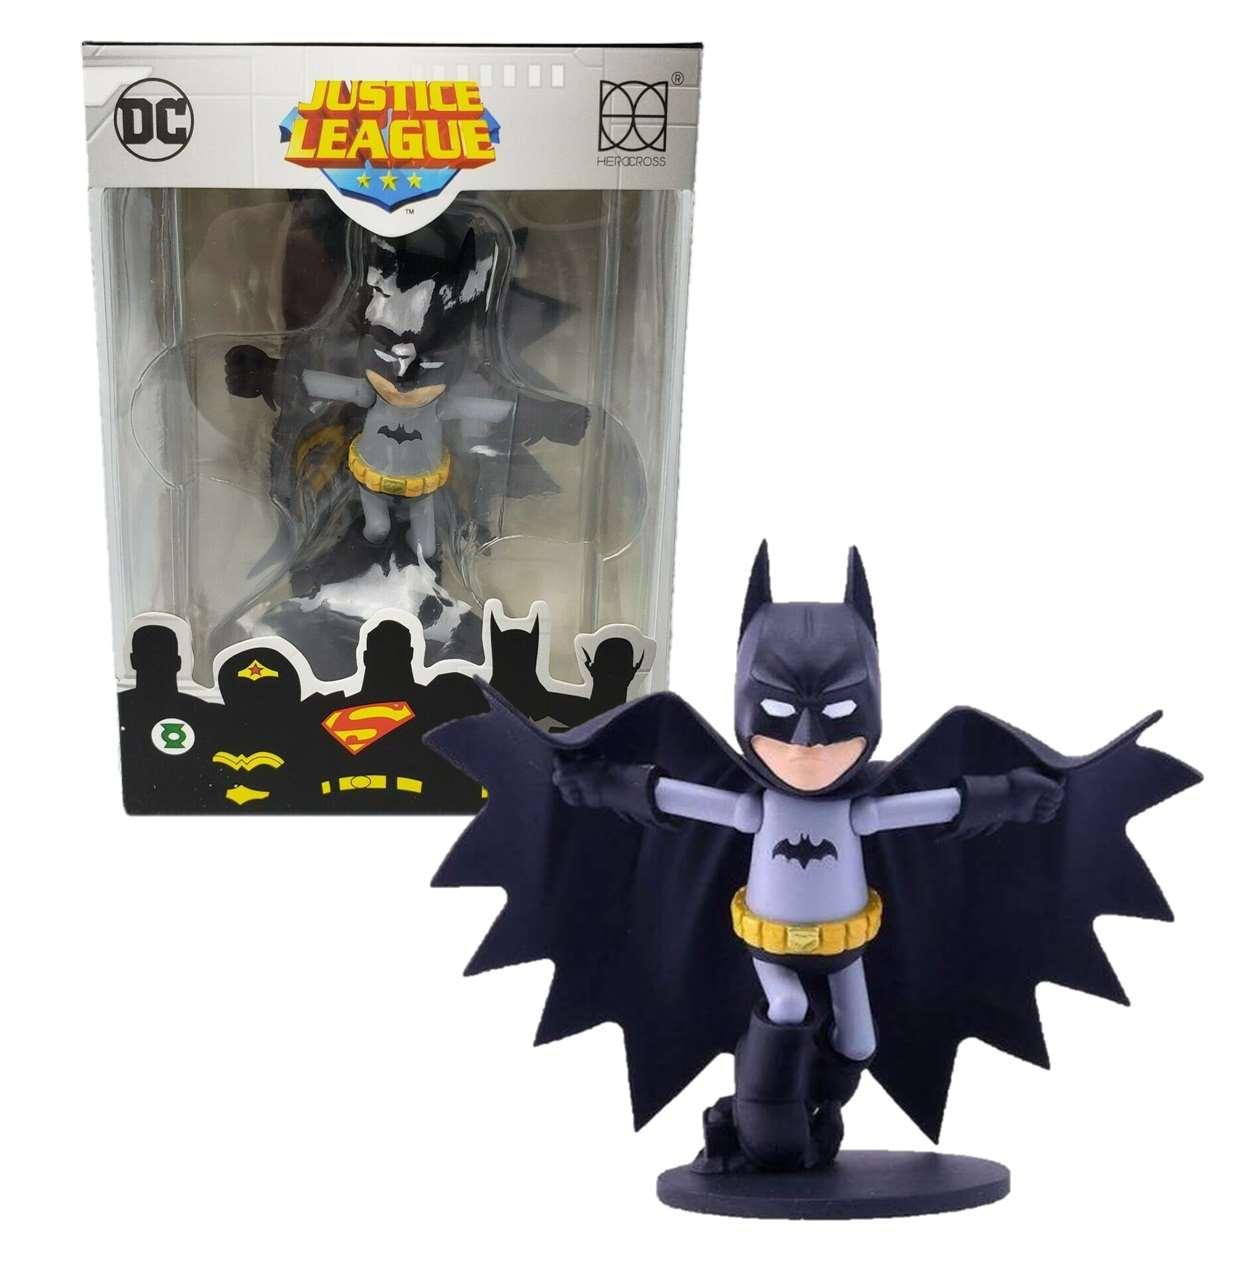 Batman Figura Justice League Dc Comics Herocross 3 PuLG